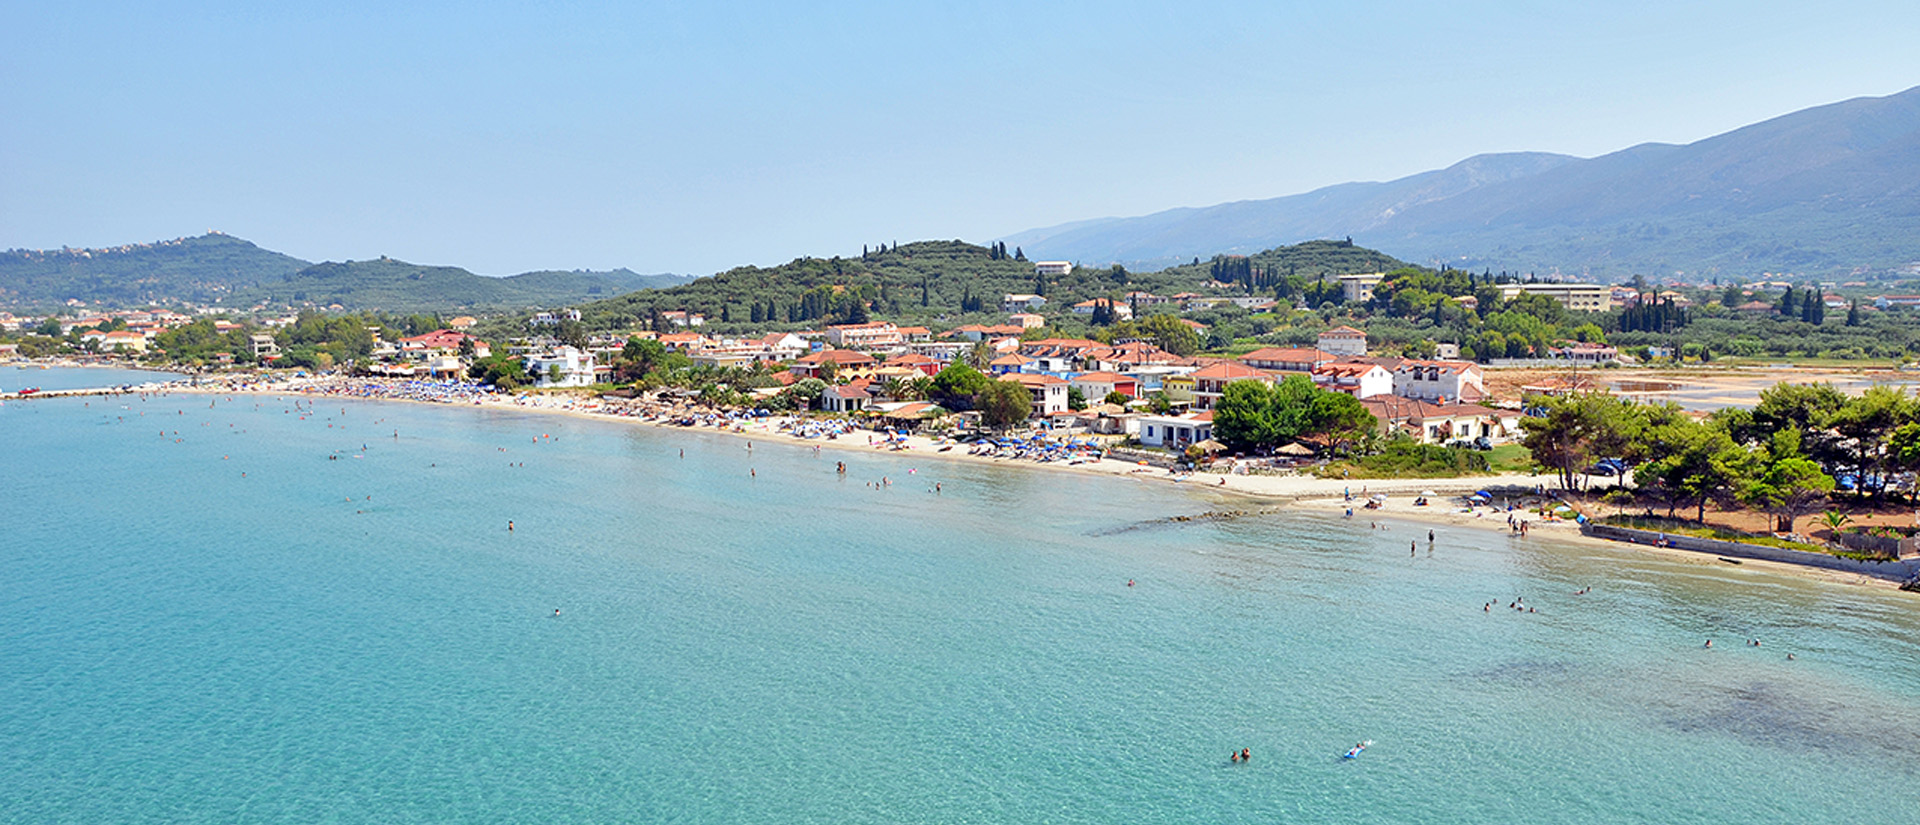 Alykes Beach, Zakynthos